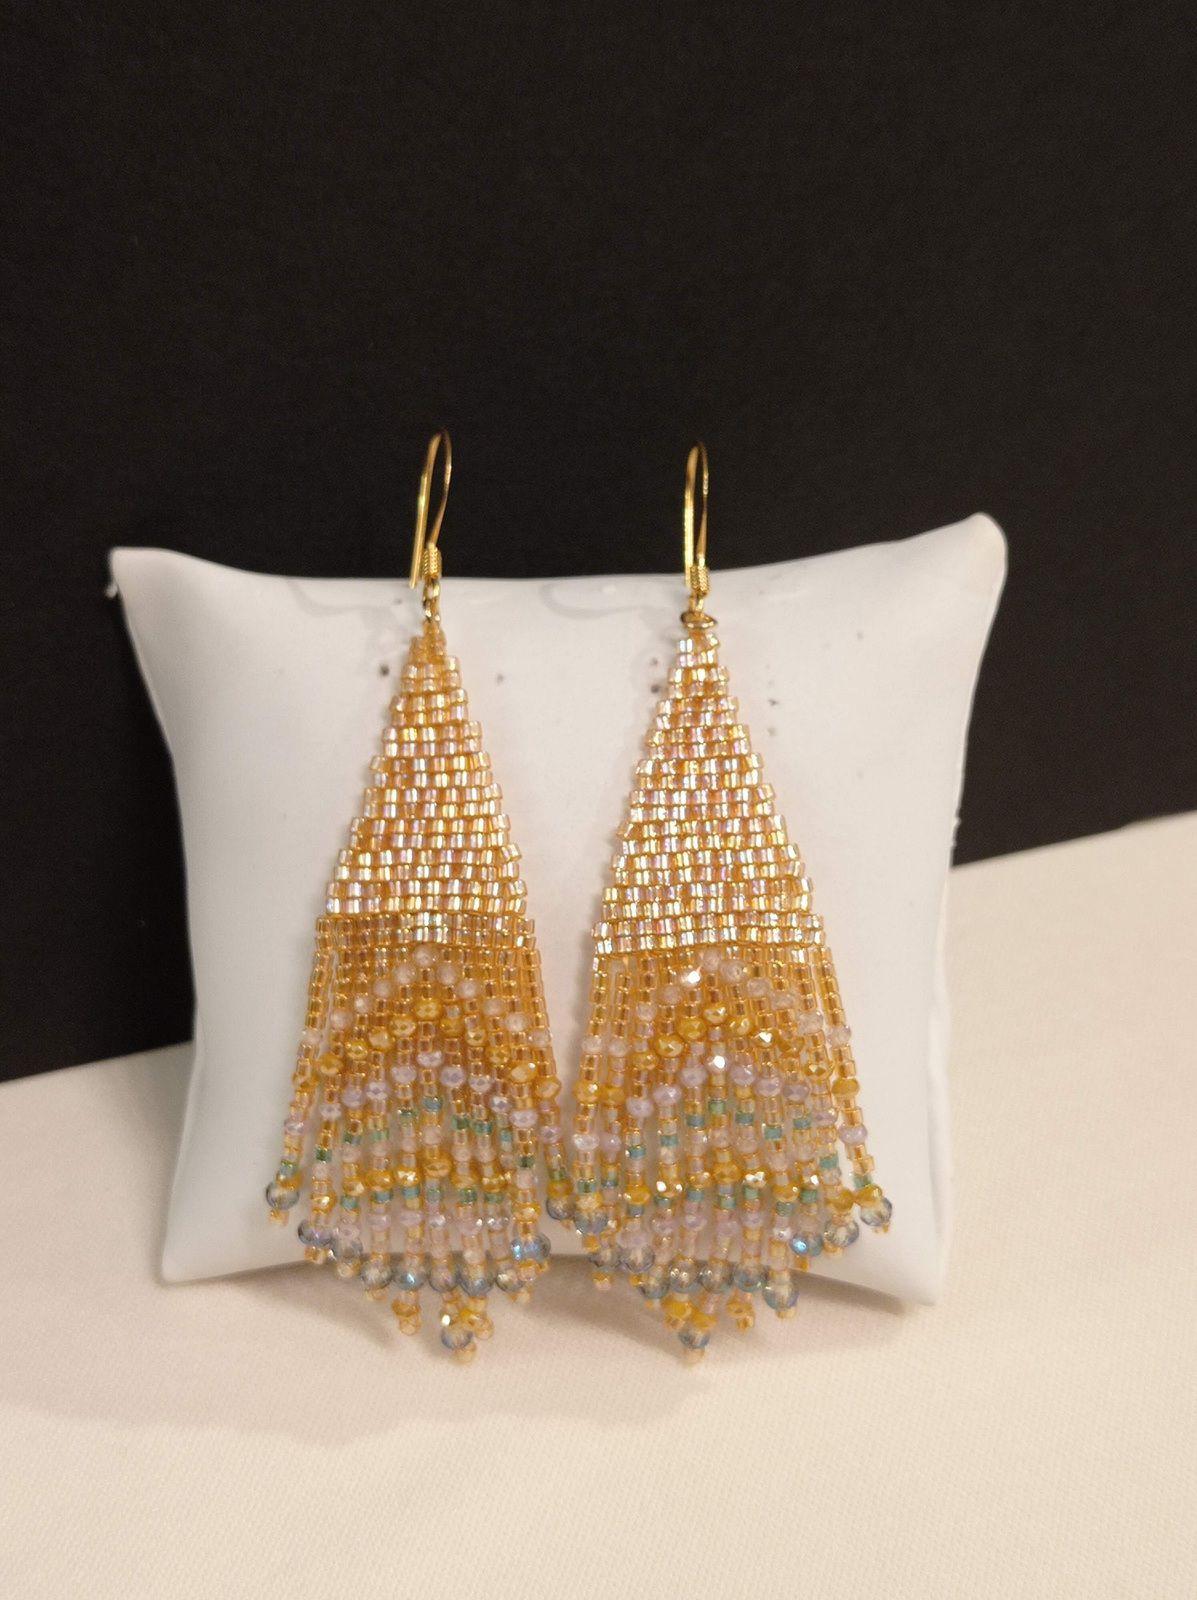 REF.VN231- BO perles de verre, zirconium, cristal, crochets dorés à l'or fin, long. 8cm. l'art. 2cm. 29€.